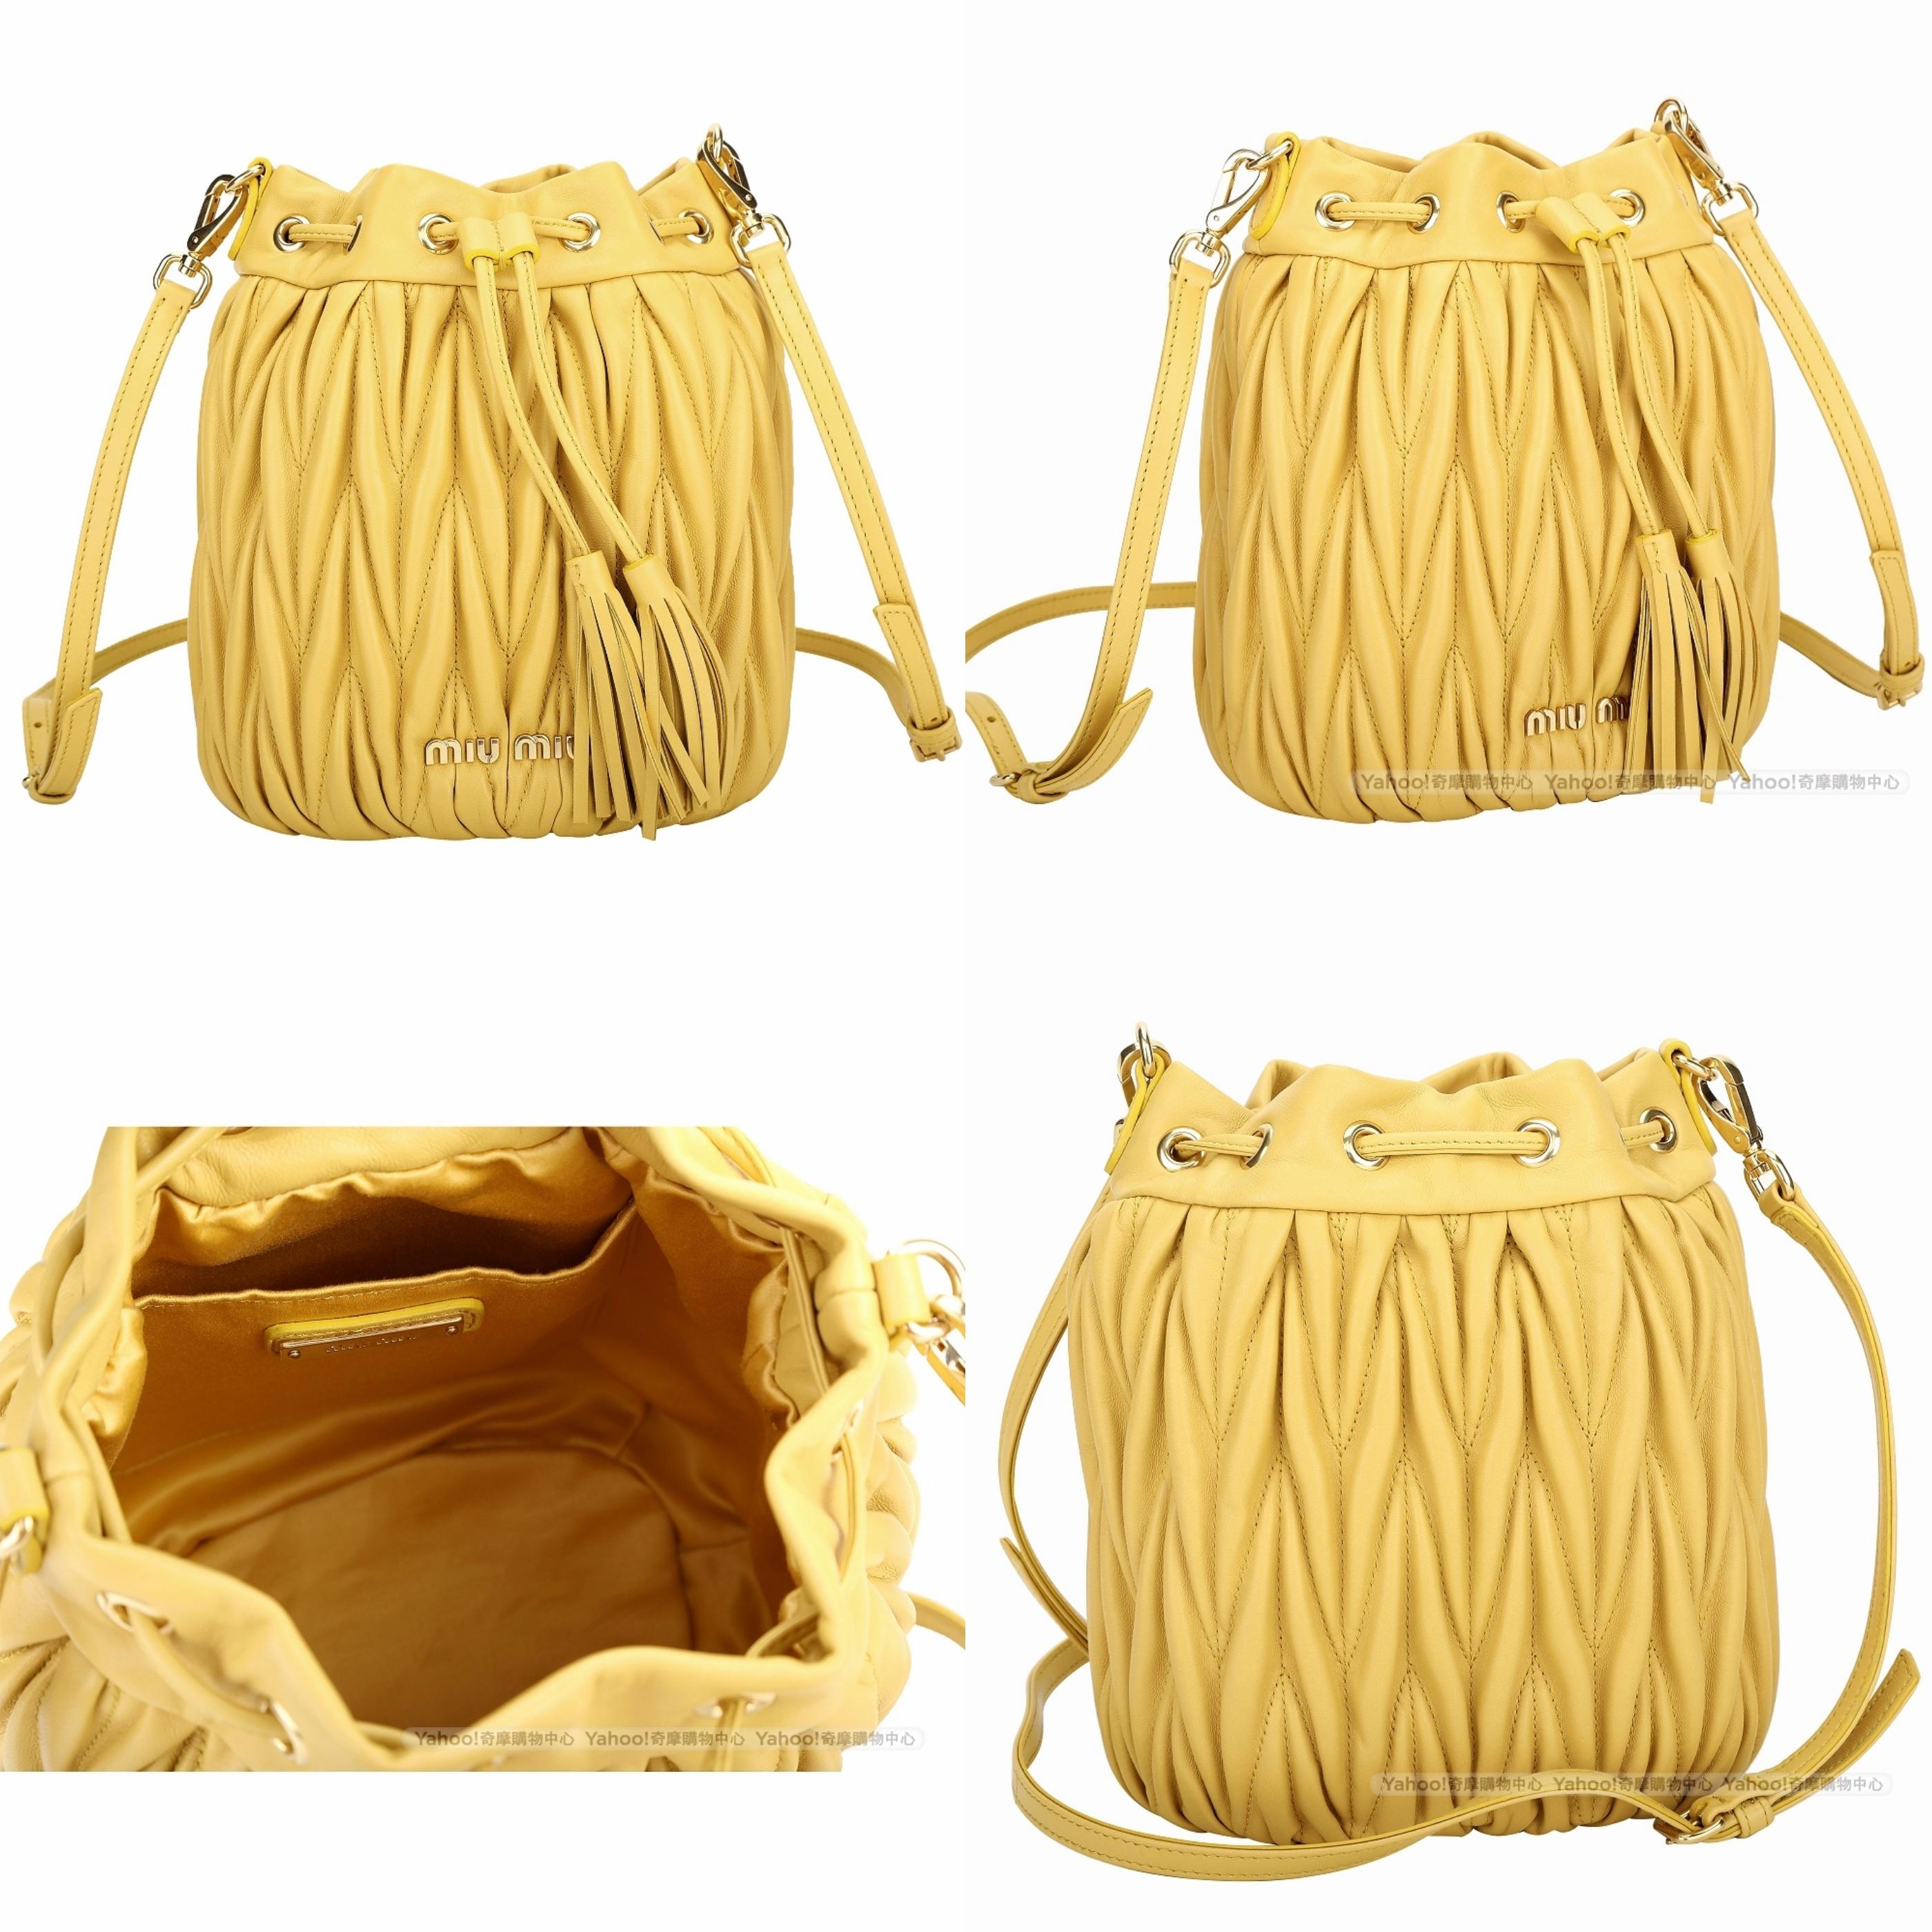 miu miu Matelasse 抓皺納帕皮革束口斜背水桶包(黃色) 經典時尚的皺摺設計與奢華的絕佳氣質,精采演譯出高貴優雅的迷人魅力